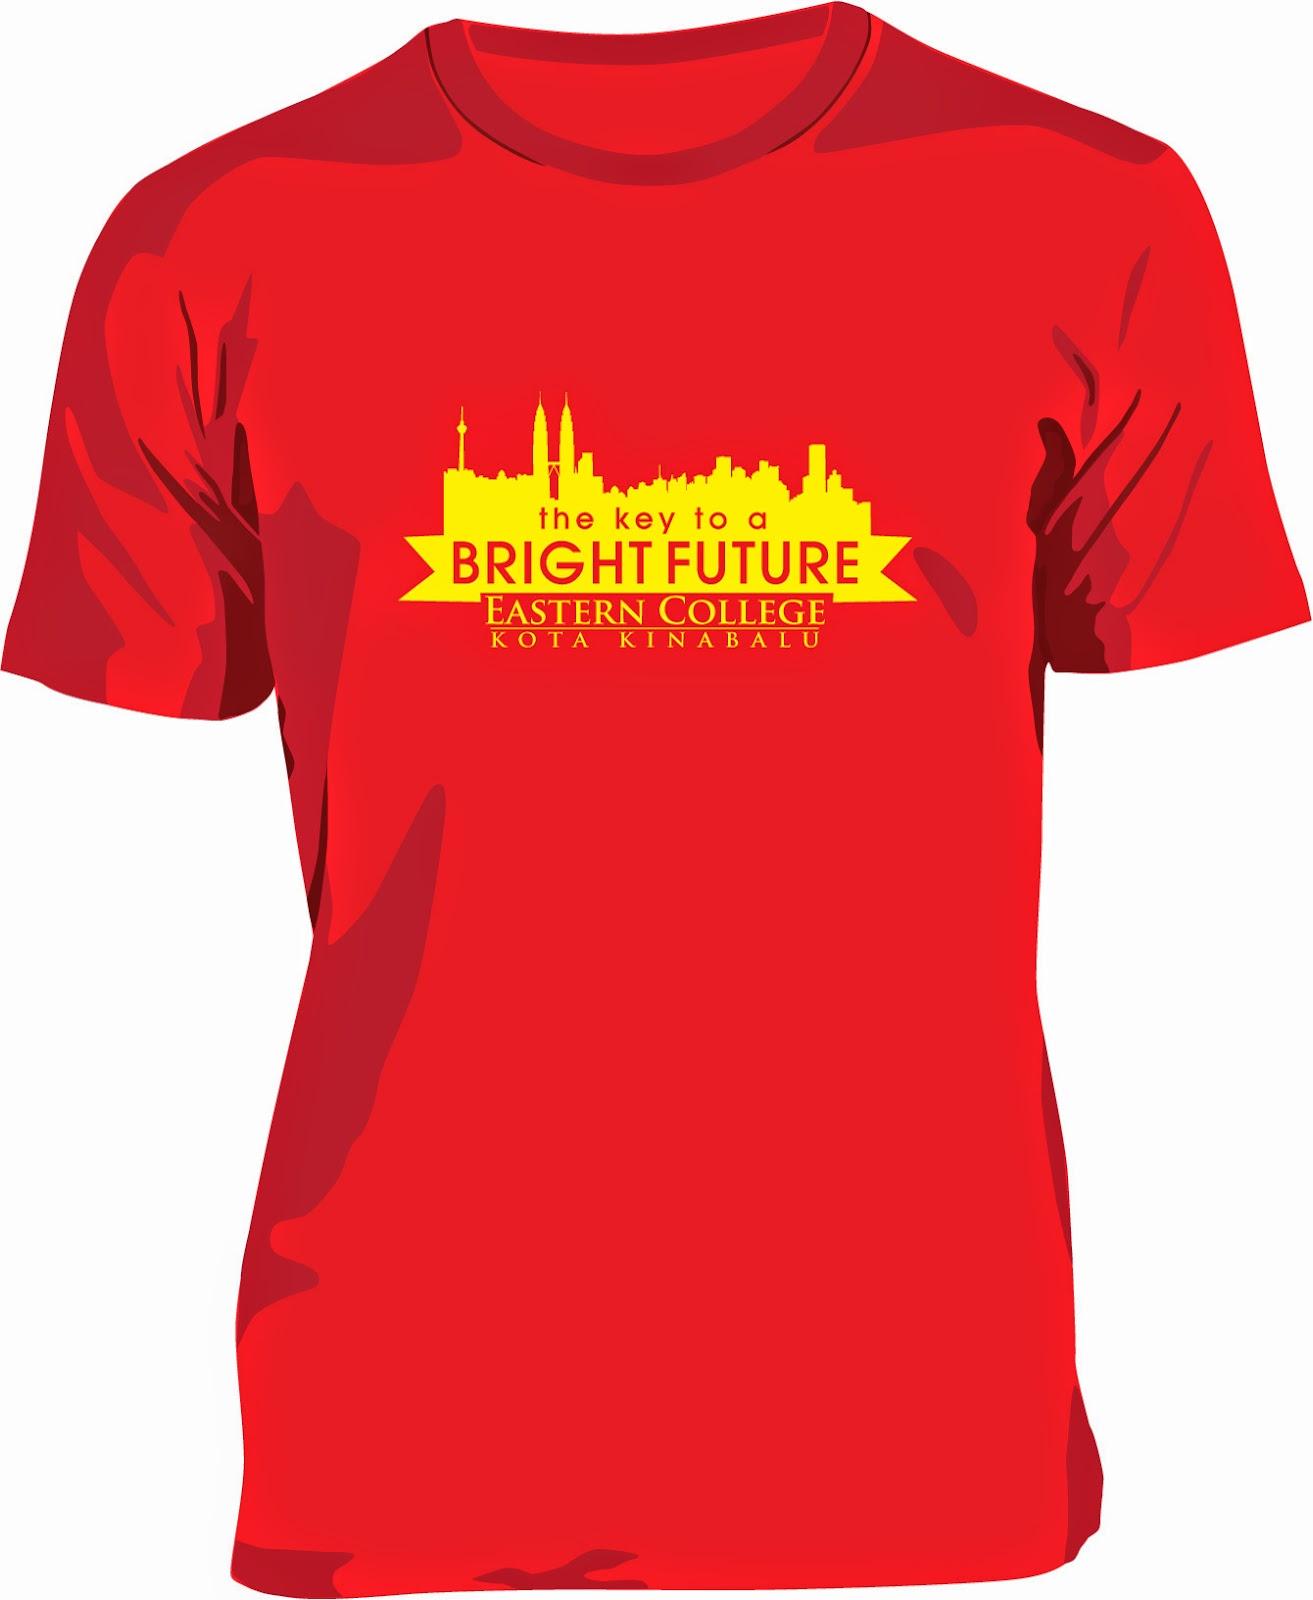 Design t shirt rewang - Cetakan 1 Warna Bahagian Depan